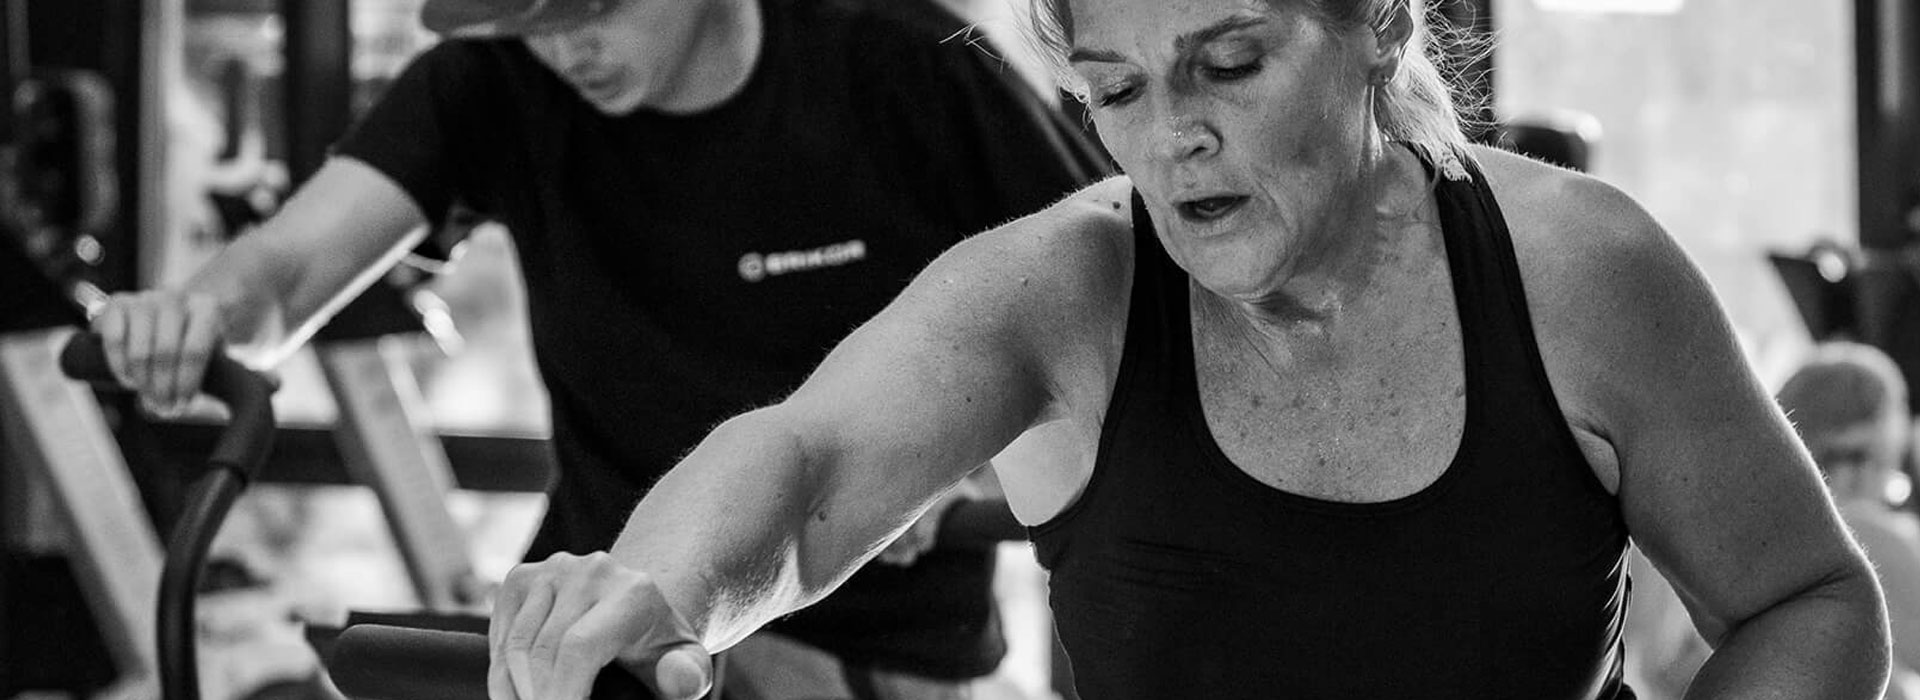 Fitness Gym in Basalt CO, Fitness Gym near El Jebel CO, Fitness Gym near Snowmass CO, Fitness Gym near Carbondale CO, Fitness Gym near Woody Creek CO, Fitness Gym near Aspen CO